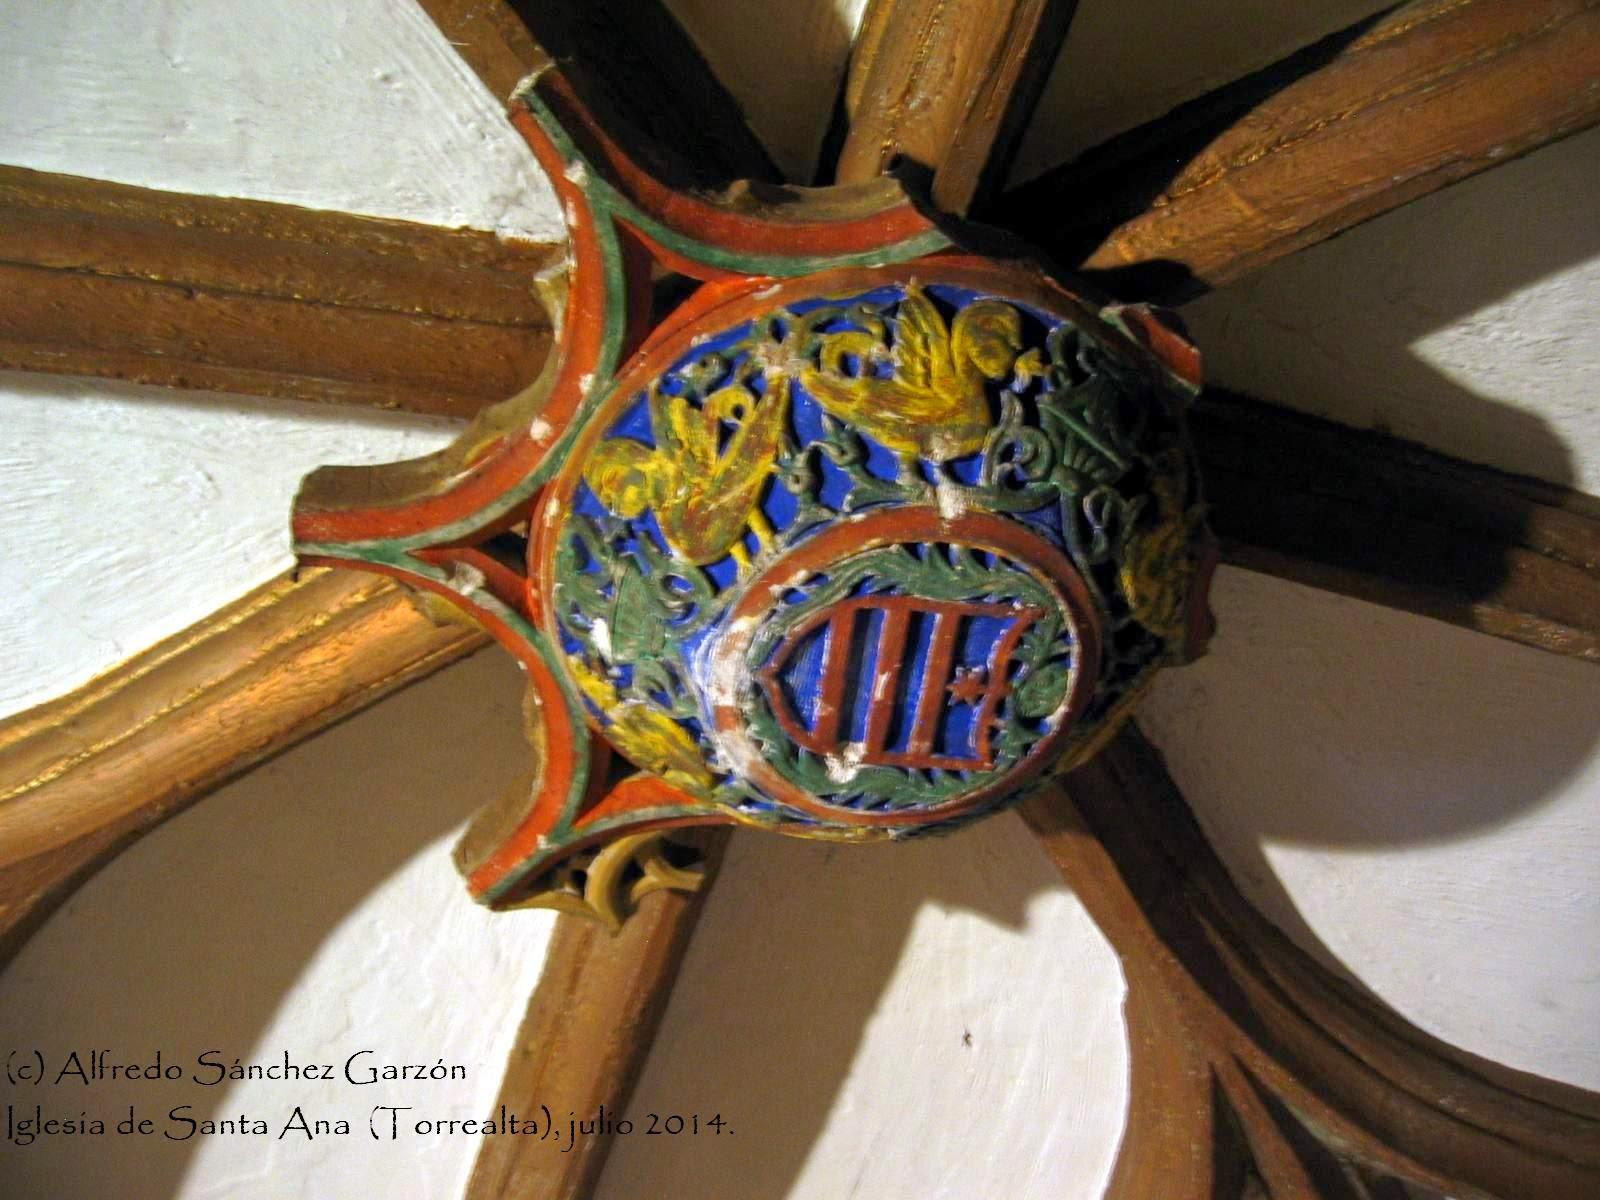 iglesia-santa-ana-torrealta-cupula-floron